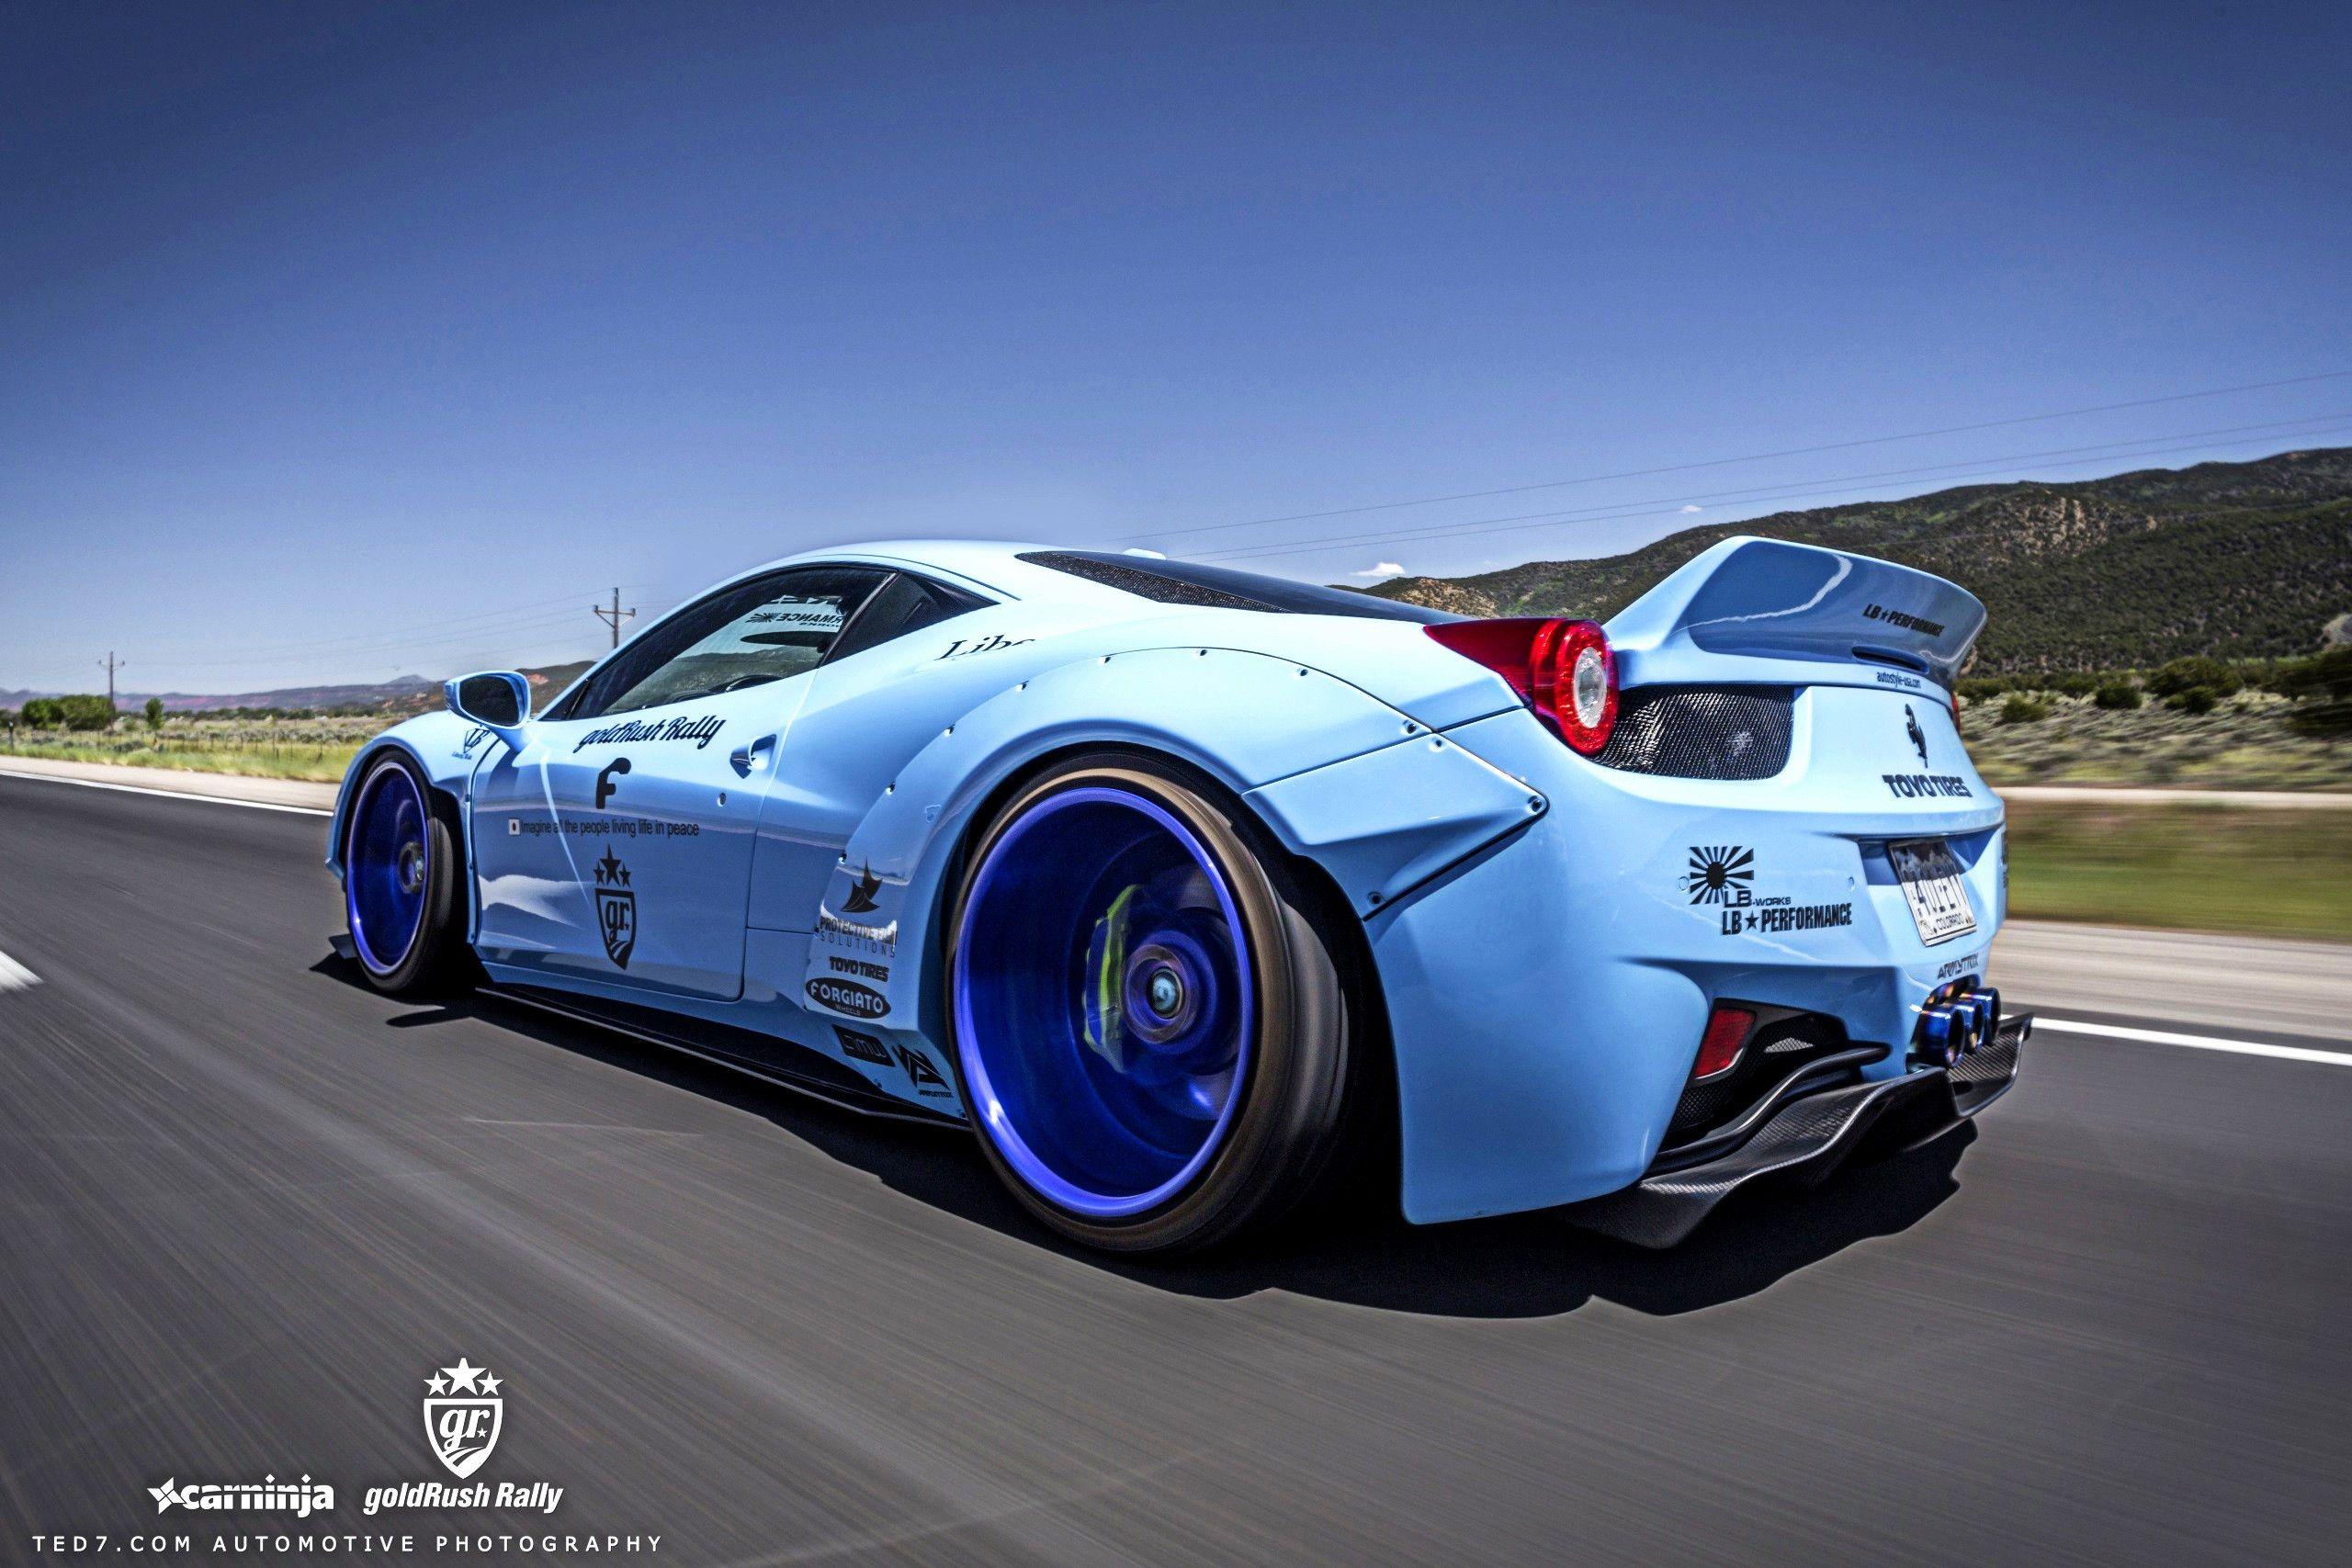 liberty walk ferrari 458 liberty walk 458 wallpapers maybe something for https - Ferrari 458 Blue Wallpaper